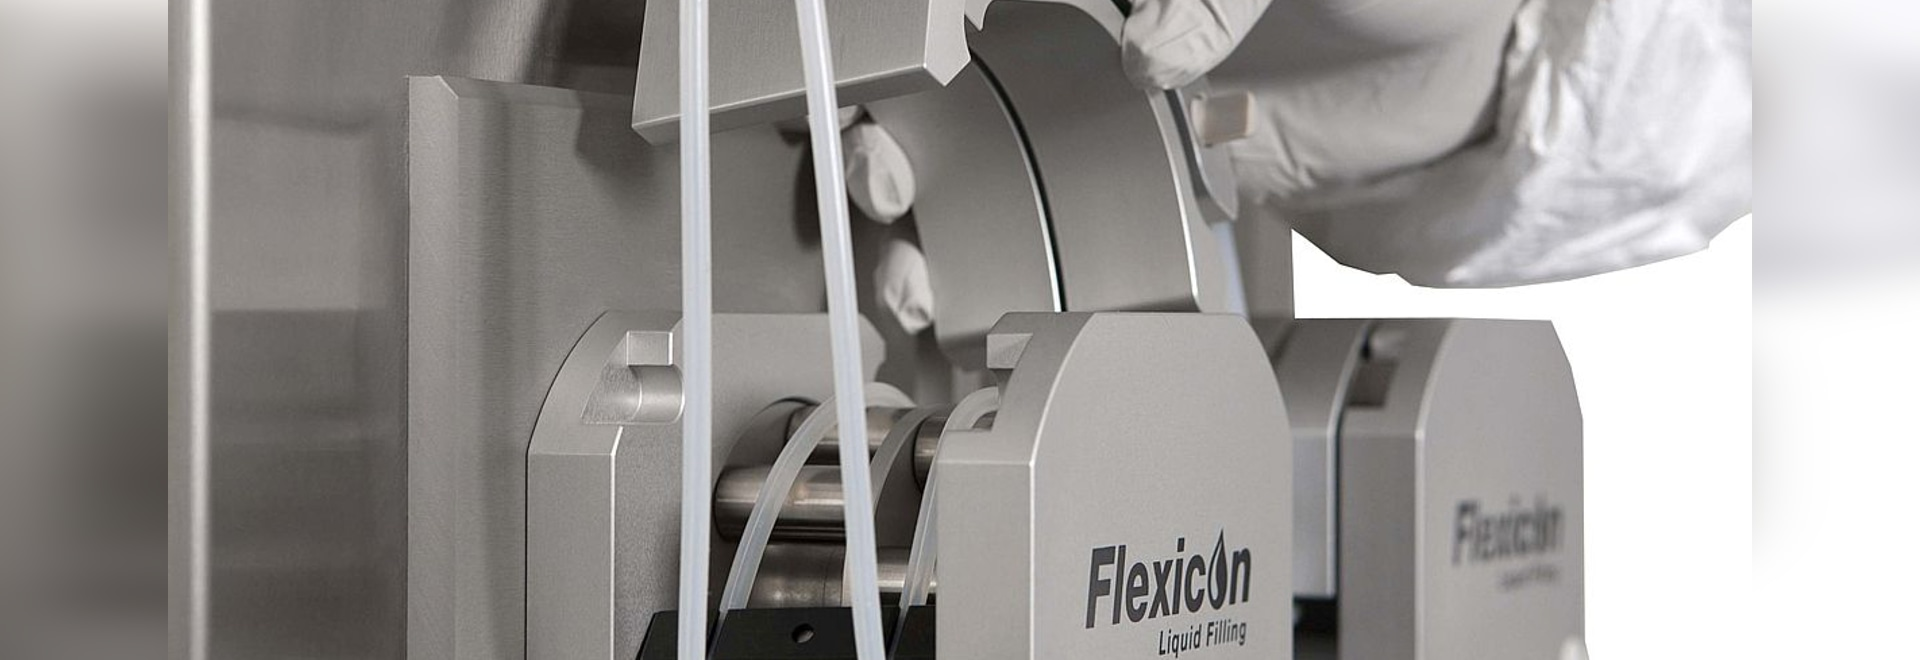 Flexicon pumps used to dose small volumes of liquid vitamins